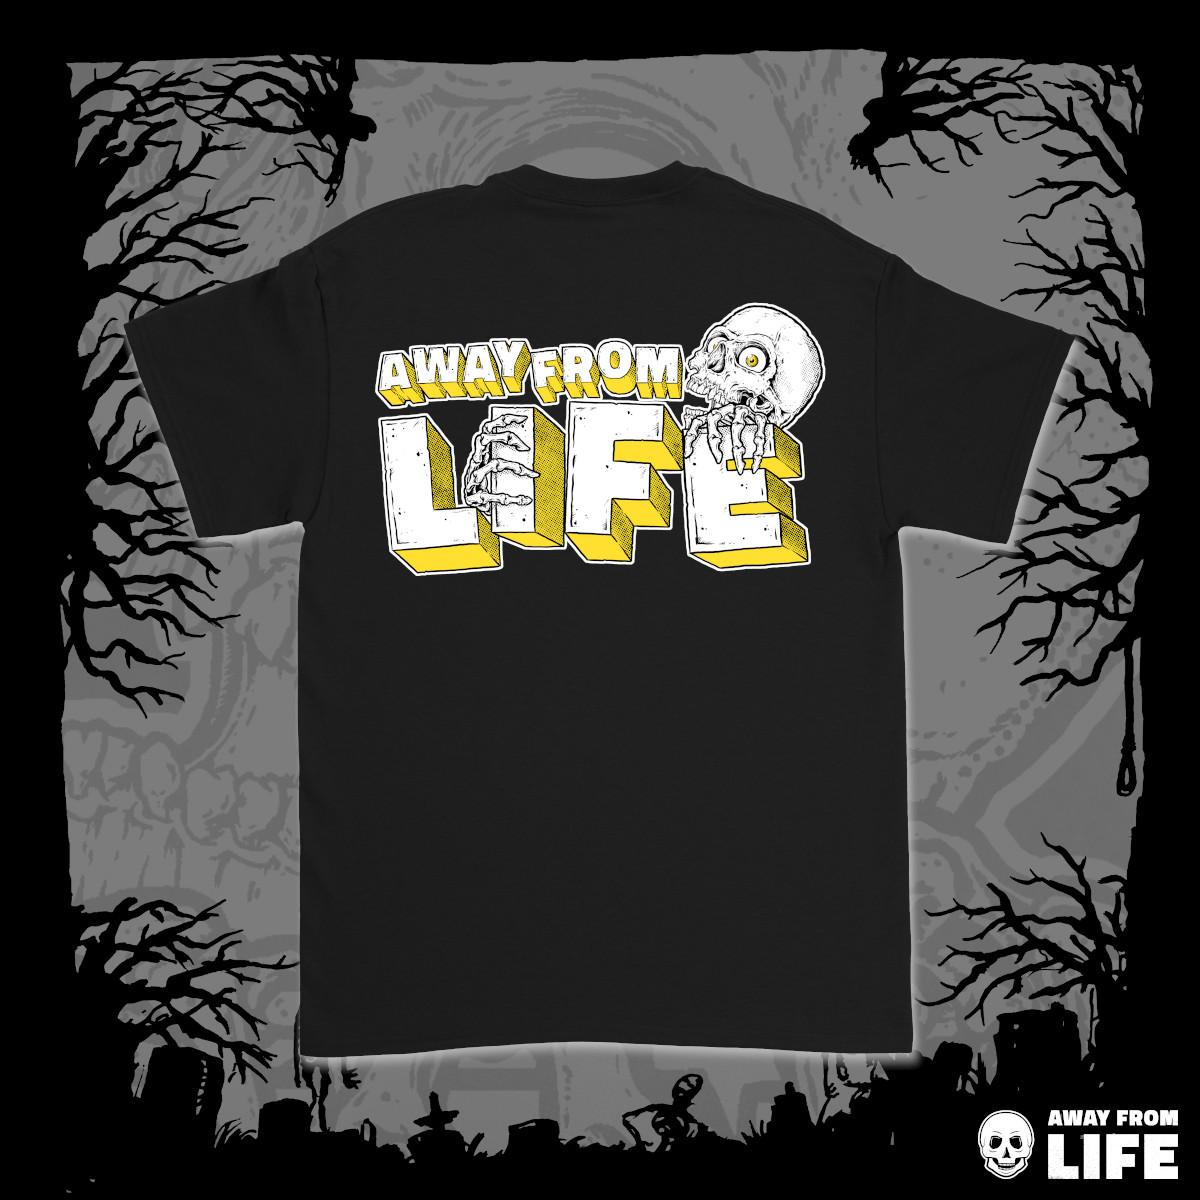 AWAY FROM LIFE - Reaper [schwarzes T-Shirt, Back]